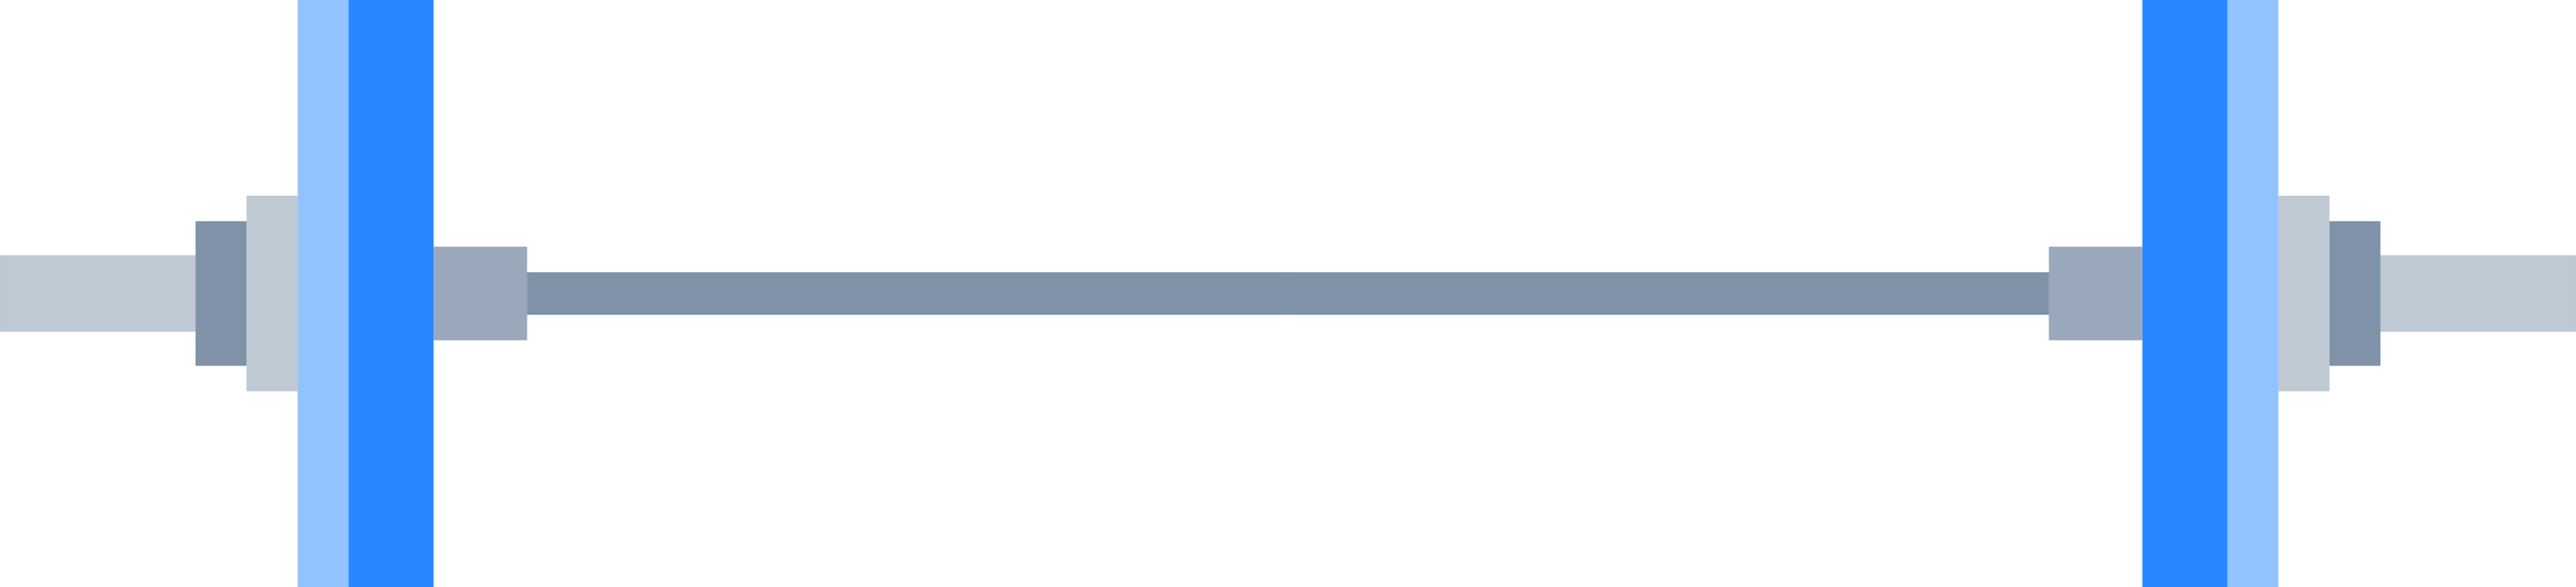 barbell Clipart illustration in PNG, SVG